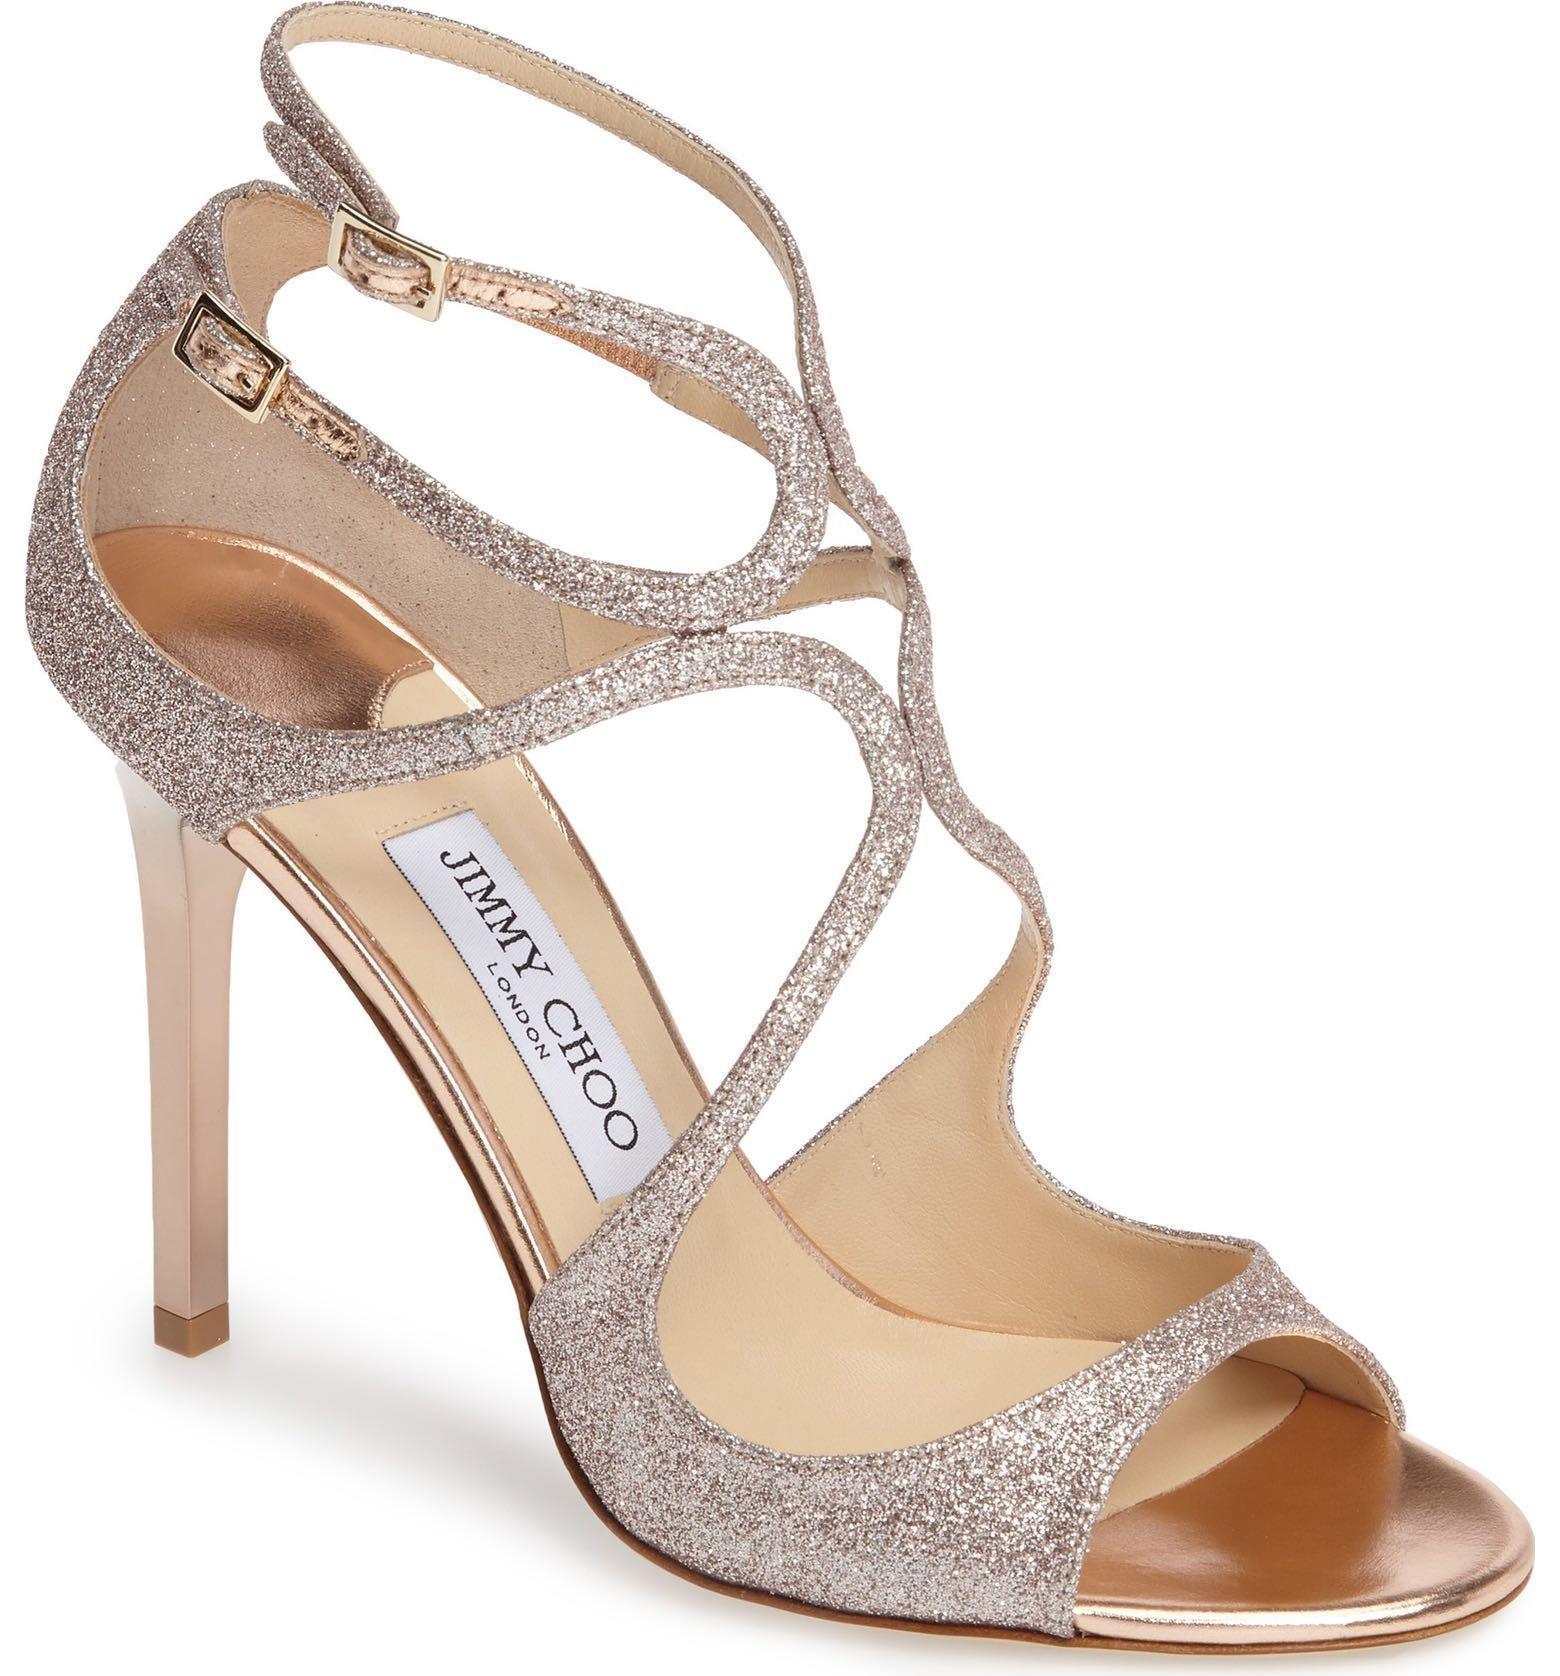 76938703010 Jimmy Choo - Lang Sandal in tea rose gold (Women)